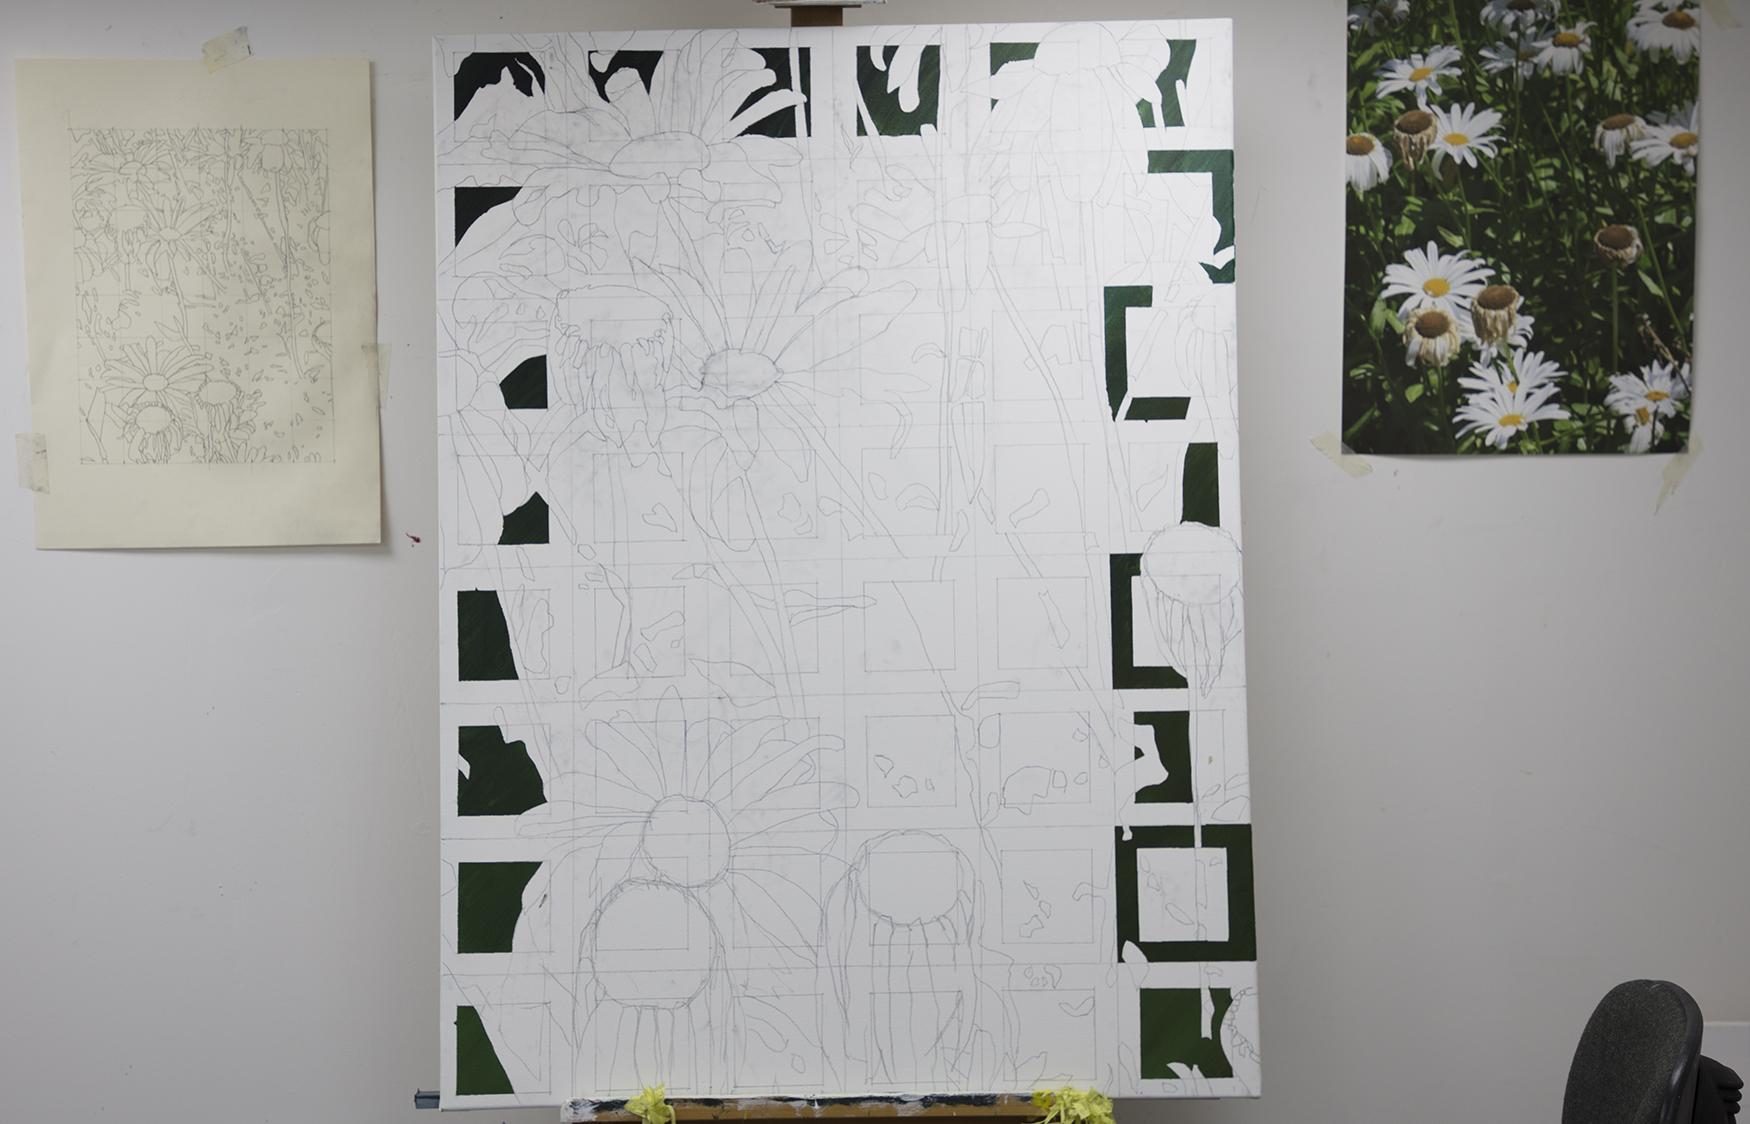 daisies-002